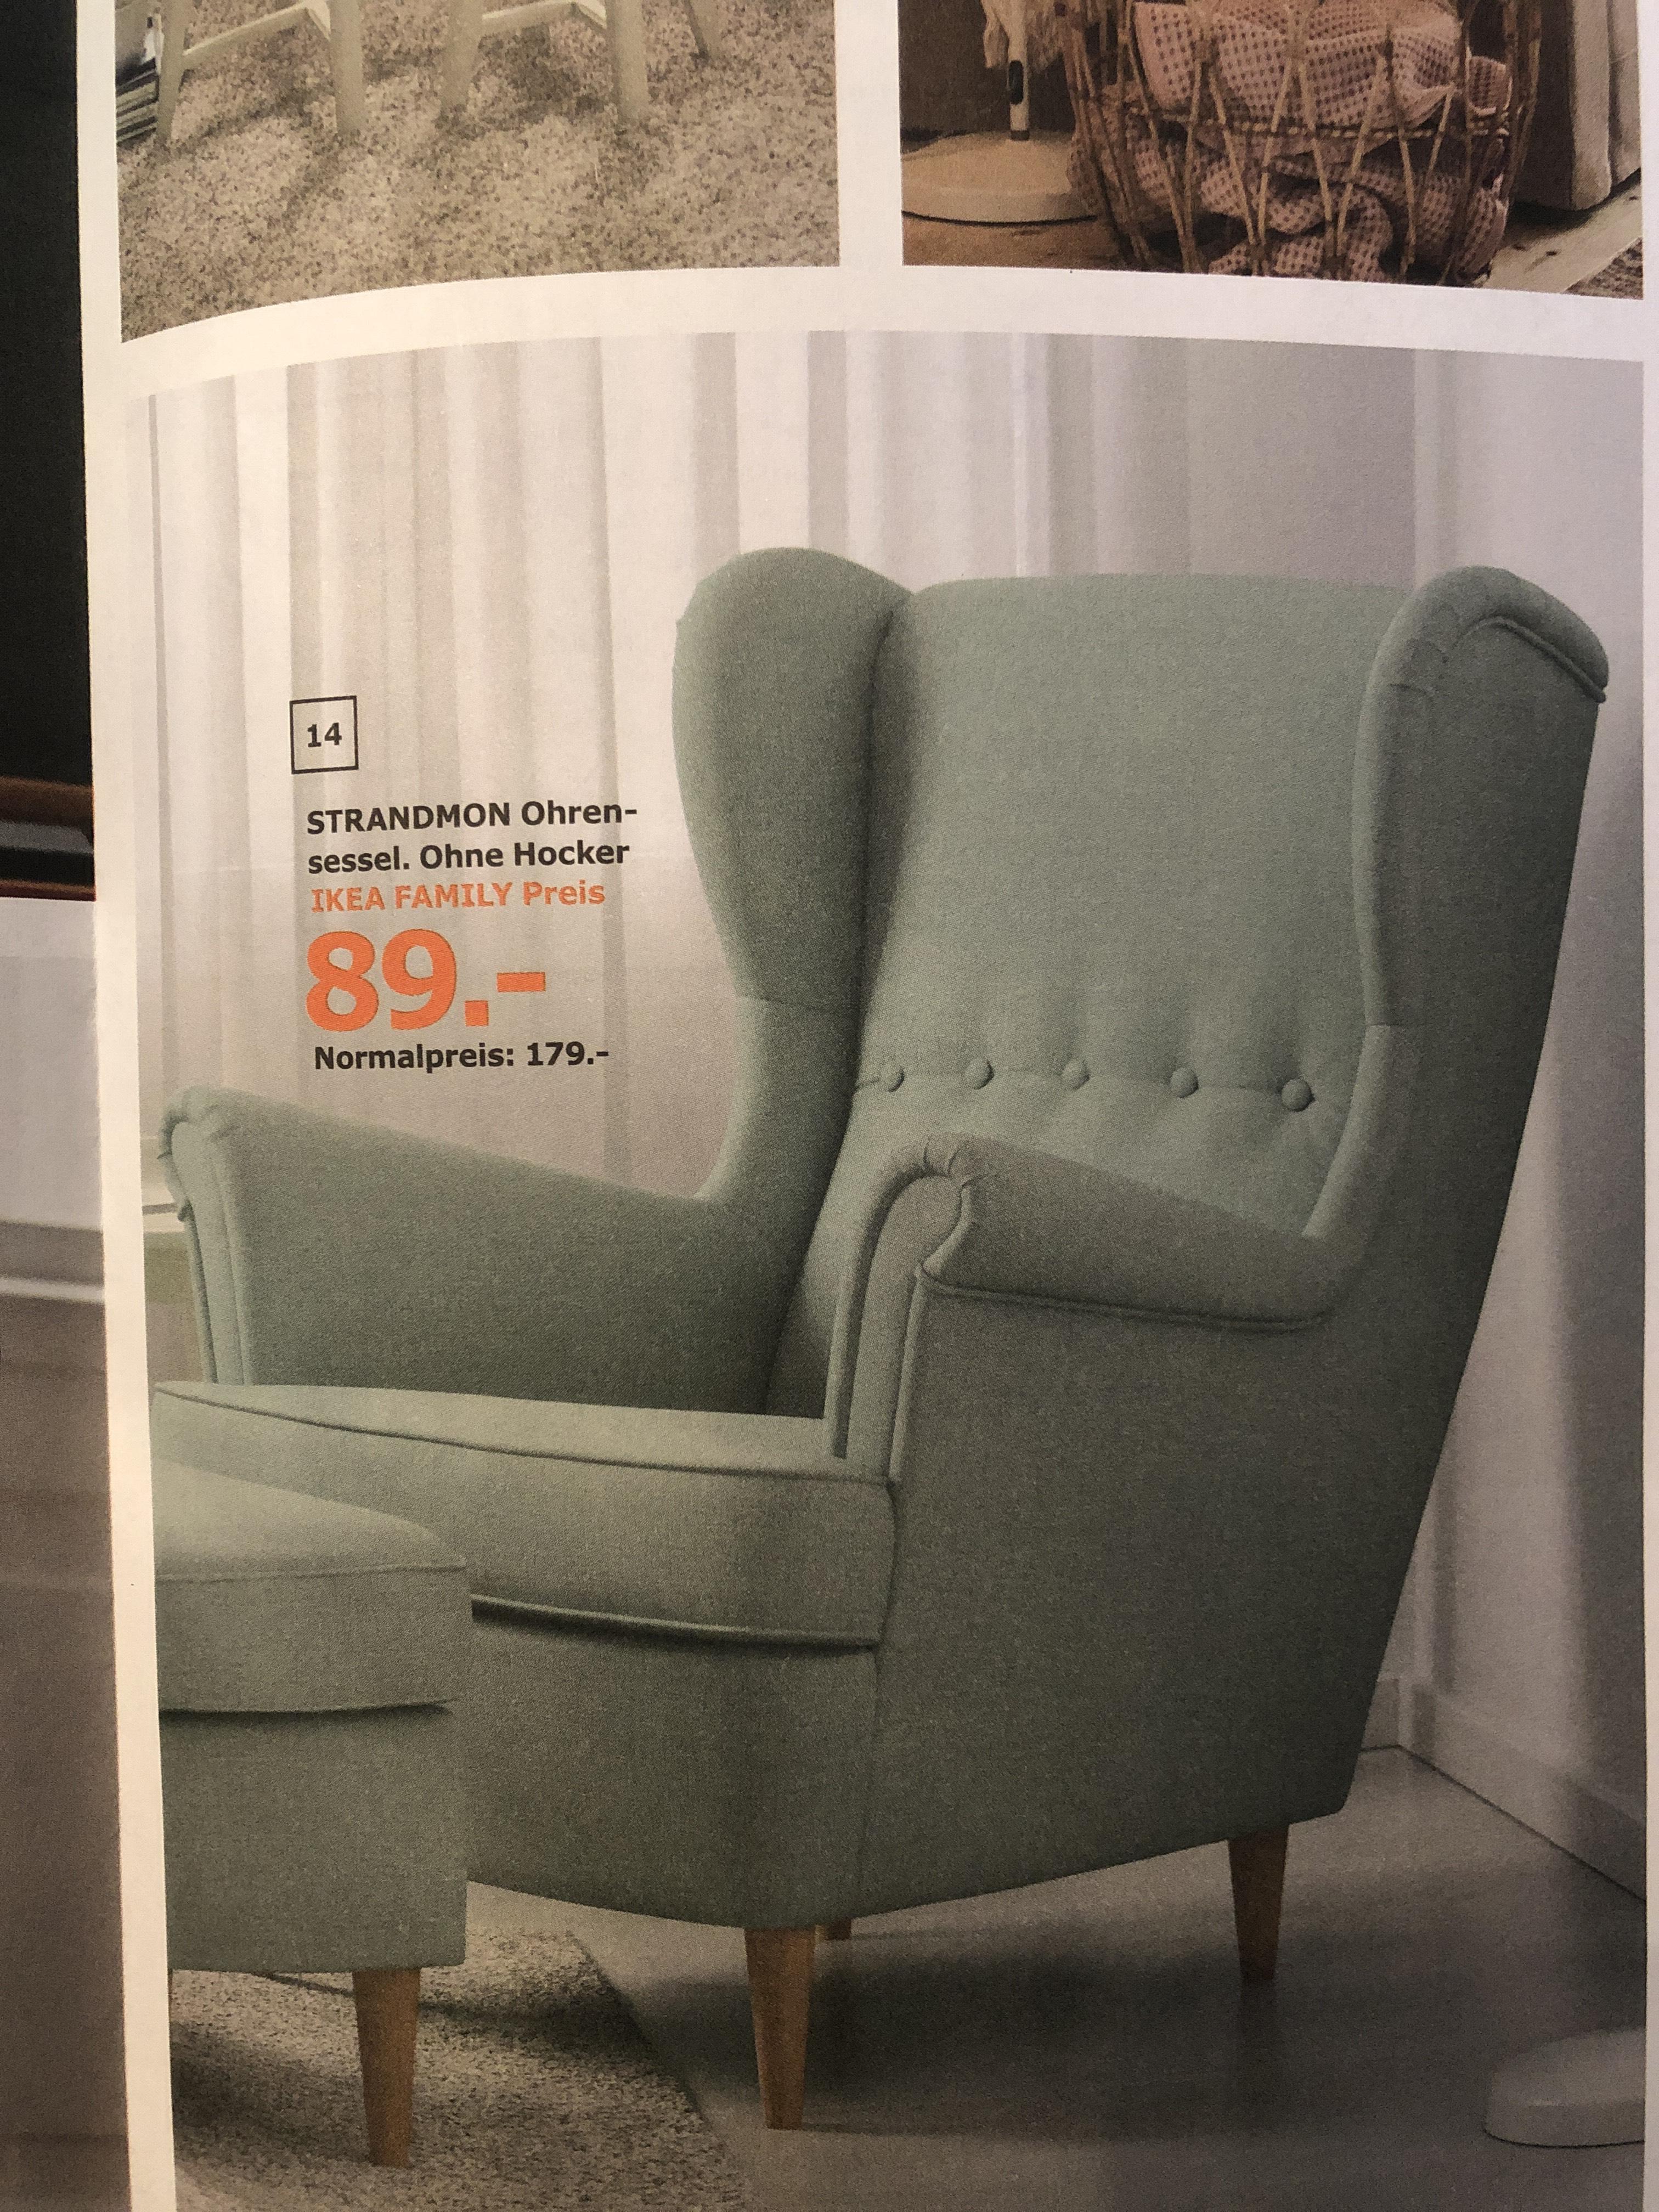 [Ggf. Lokal] IKEA Strandmon Family Preis: 89,00 - Farbe: helltürkis